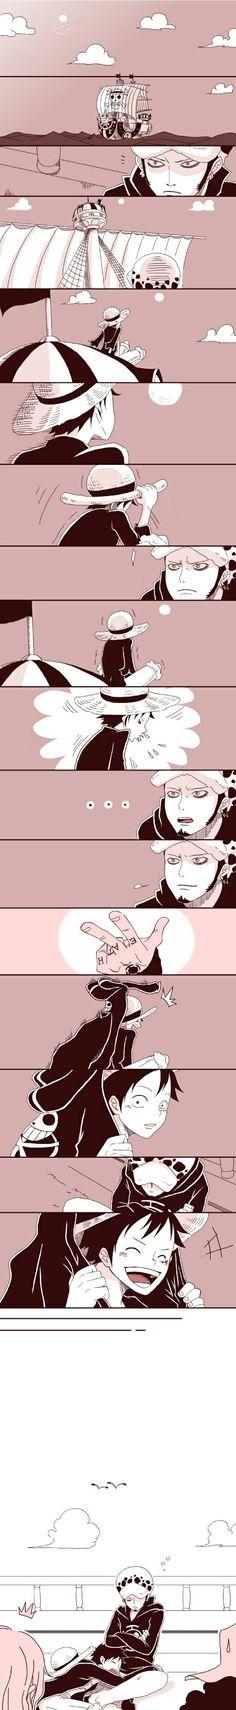 Luffy, Law, cute, yaoi, comic, jacket, sleeping; One Piece